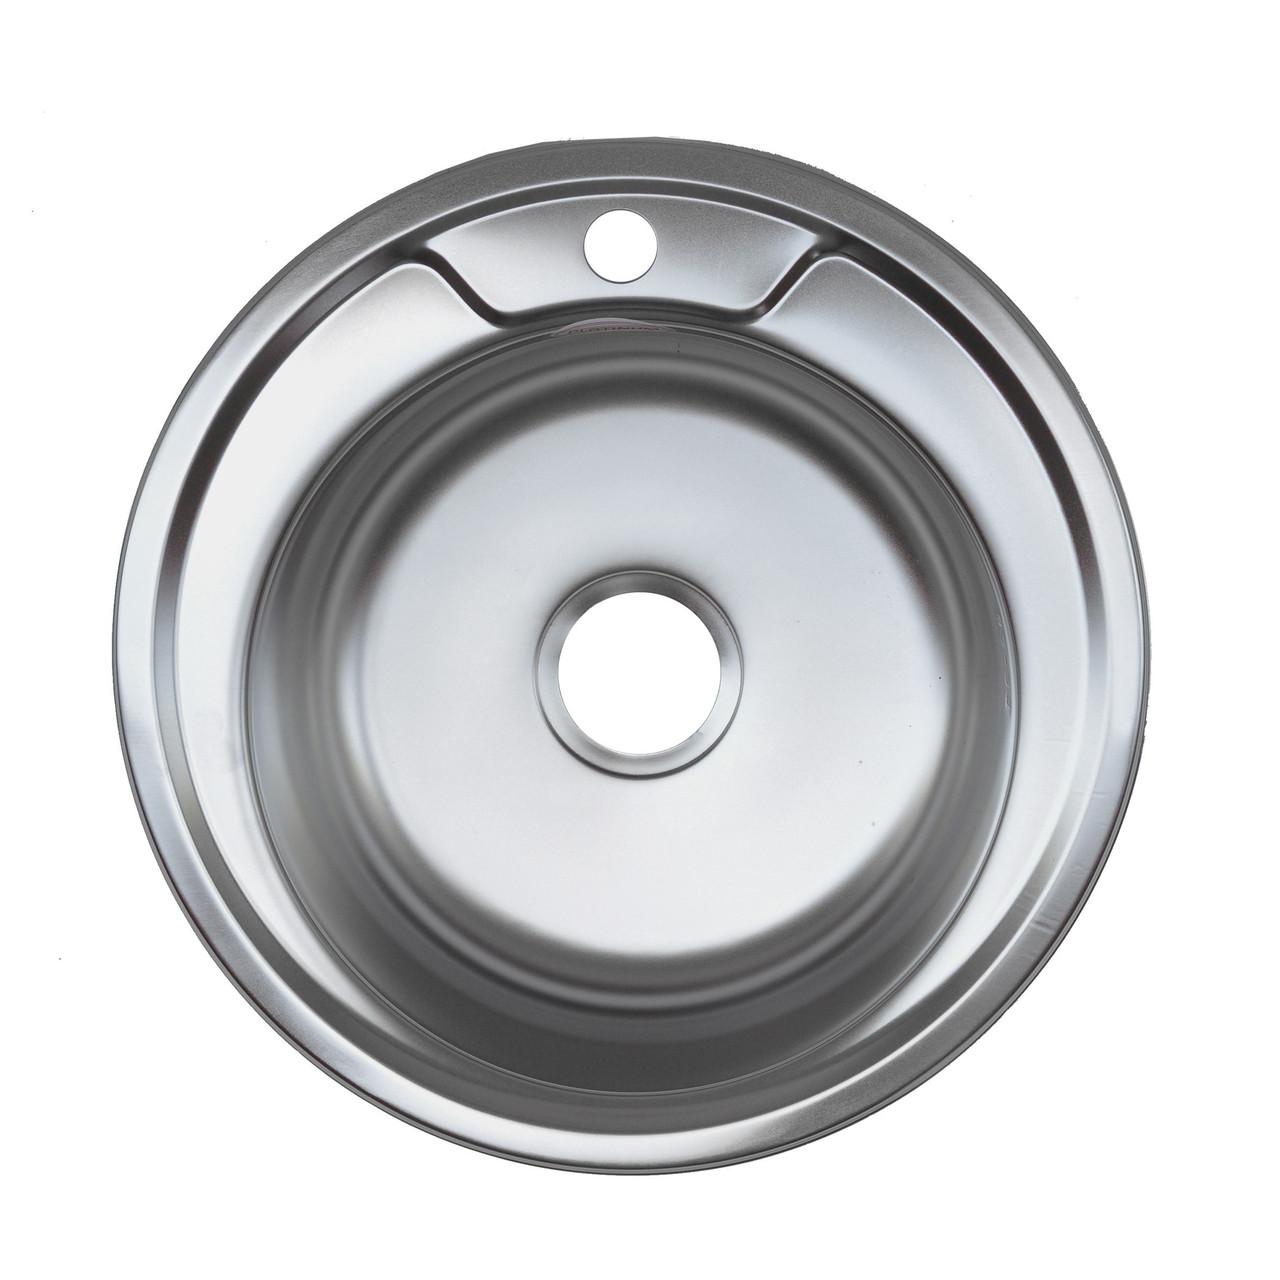 Врезная кухонная мойка Platinum 490 мм электро-сатин 0,8 мм 18 см глубина